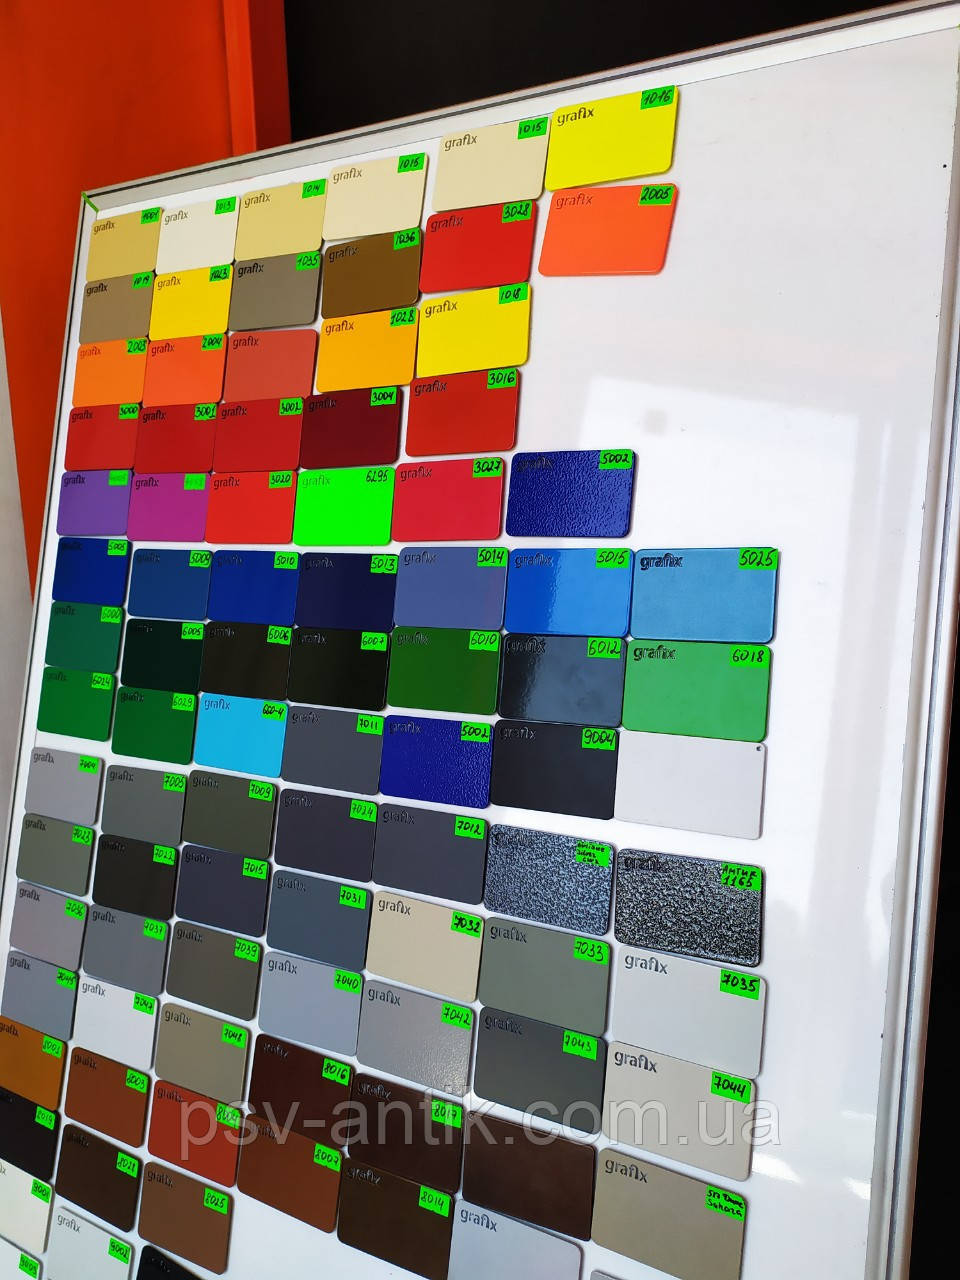 Порошковая краска глянцевая, полиэфирная, архитектурная, 5007